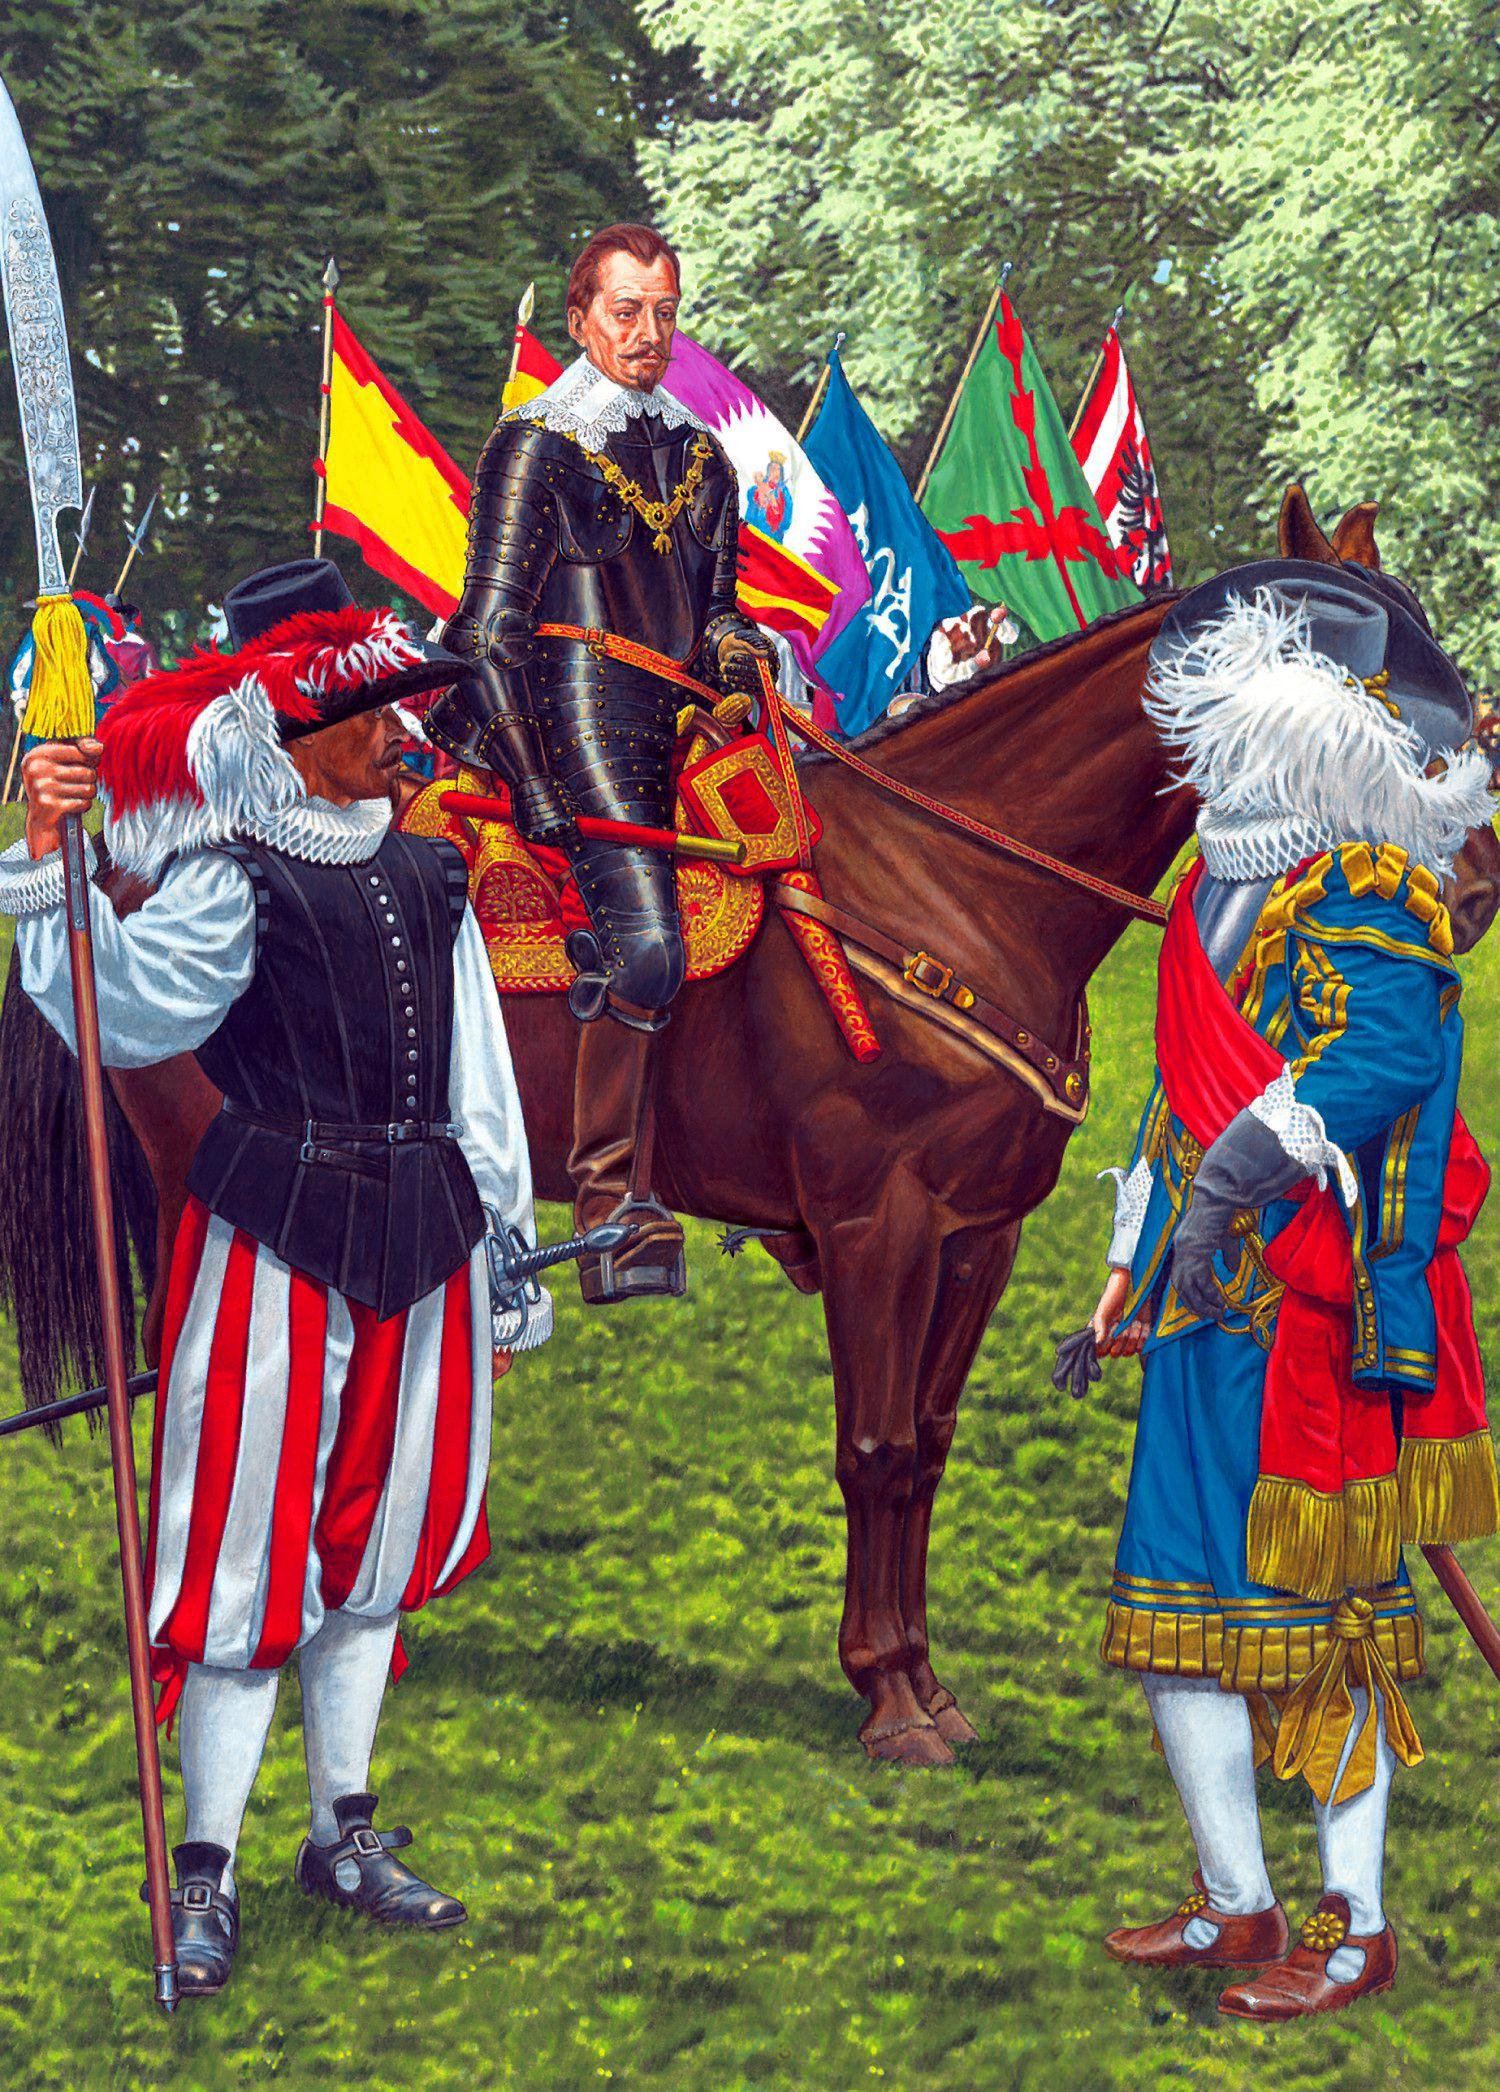 Albrecht Von Wallenstein And The Imperial Army During The